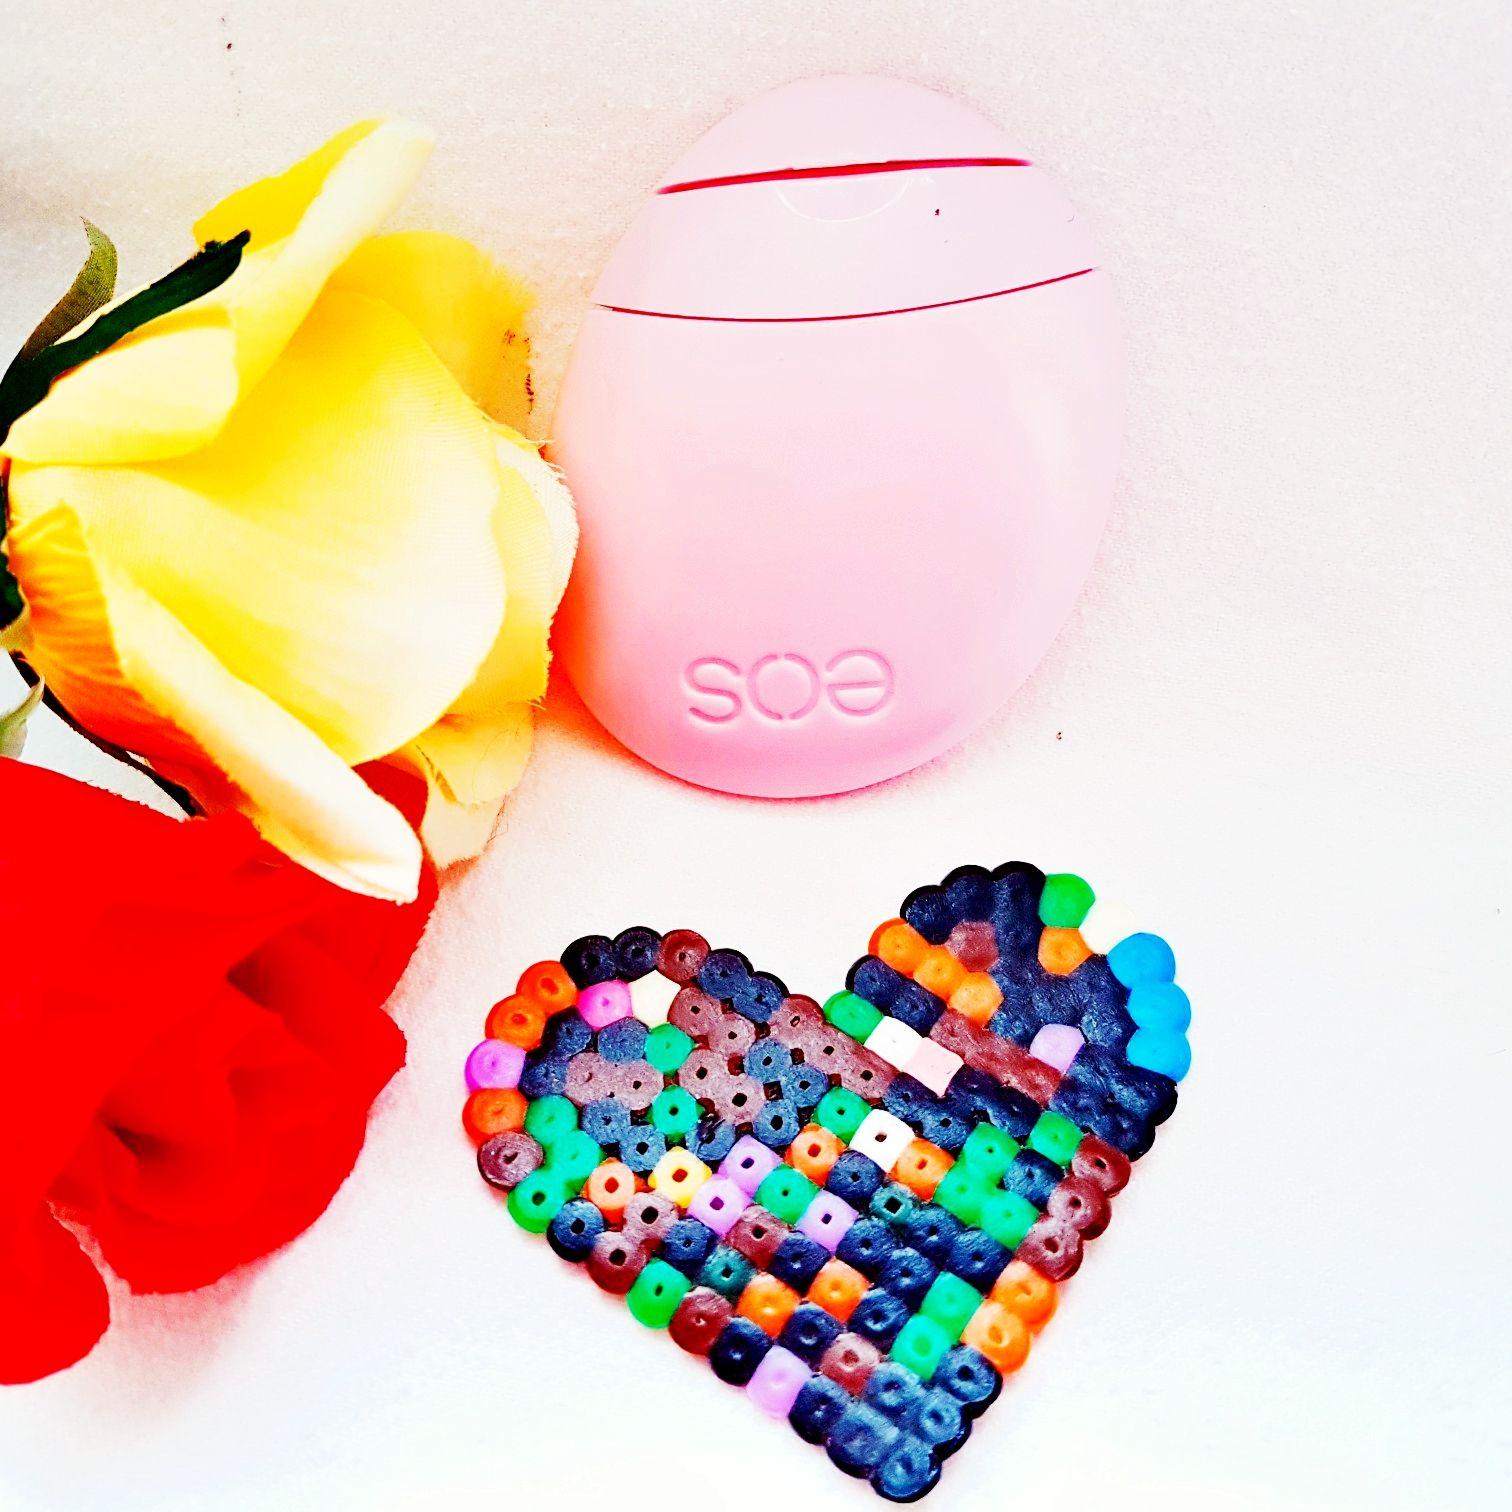 Berry Blossom Eos Handcremen Produktpaket